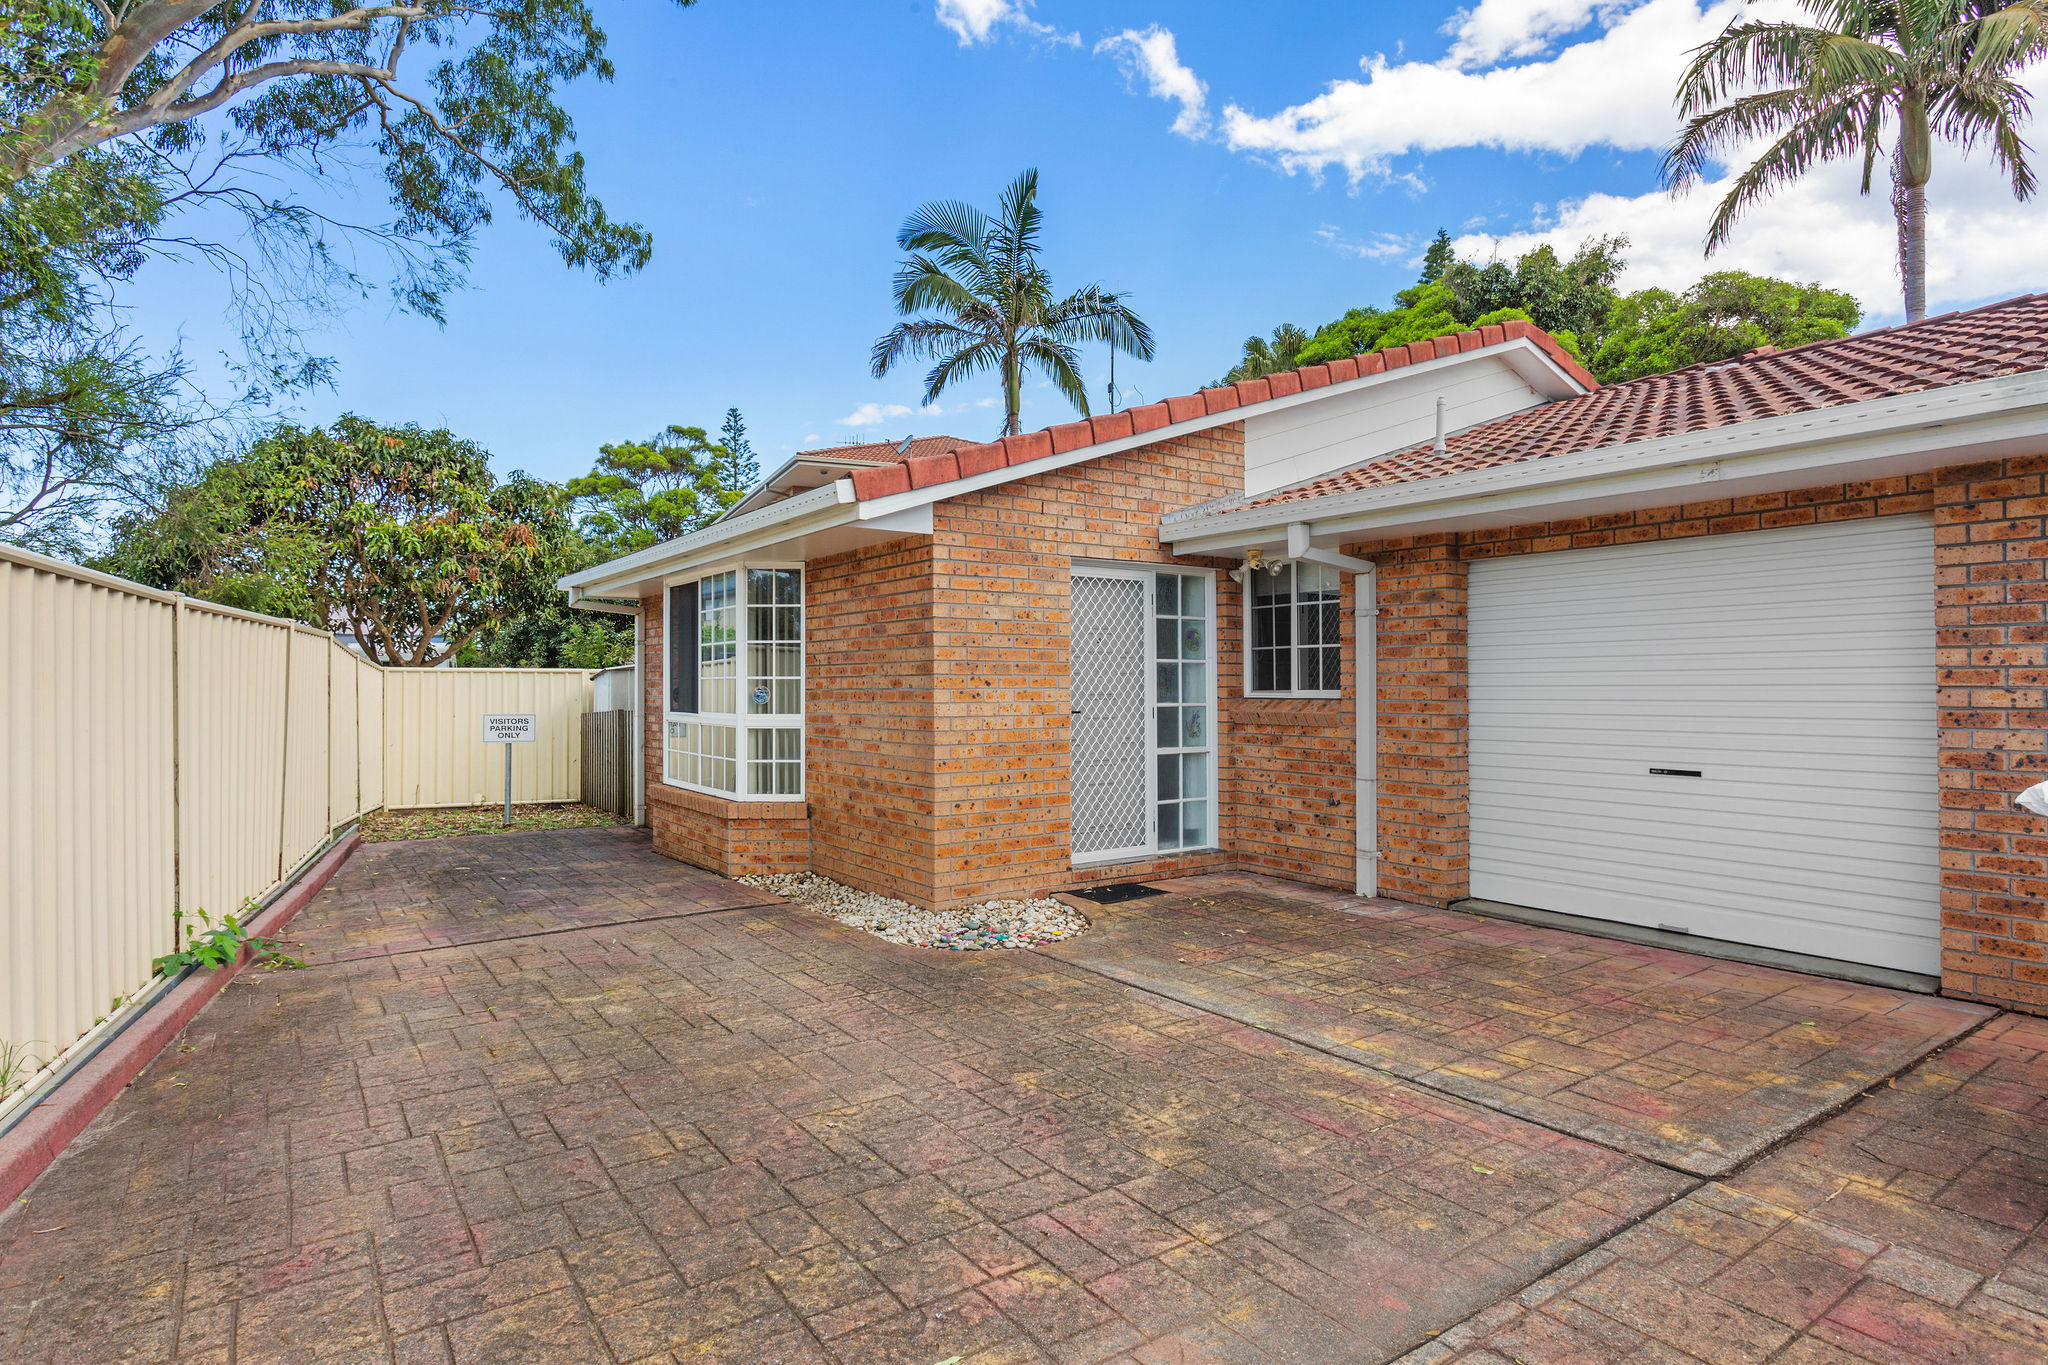 Vendor Review - Best Real Estate agent